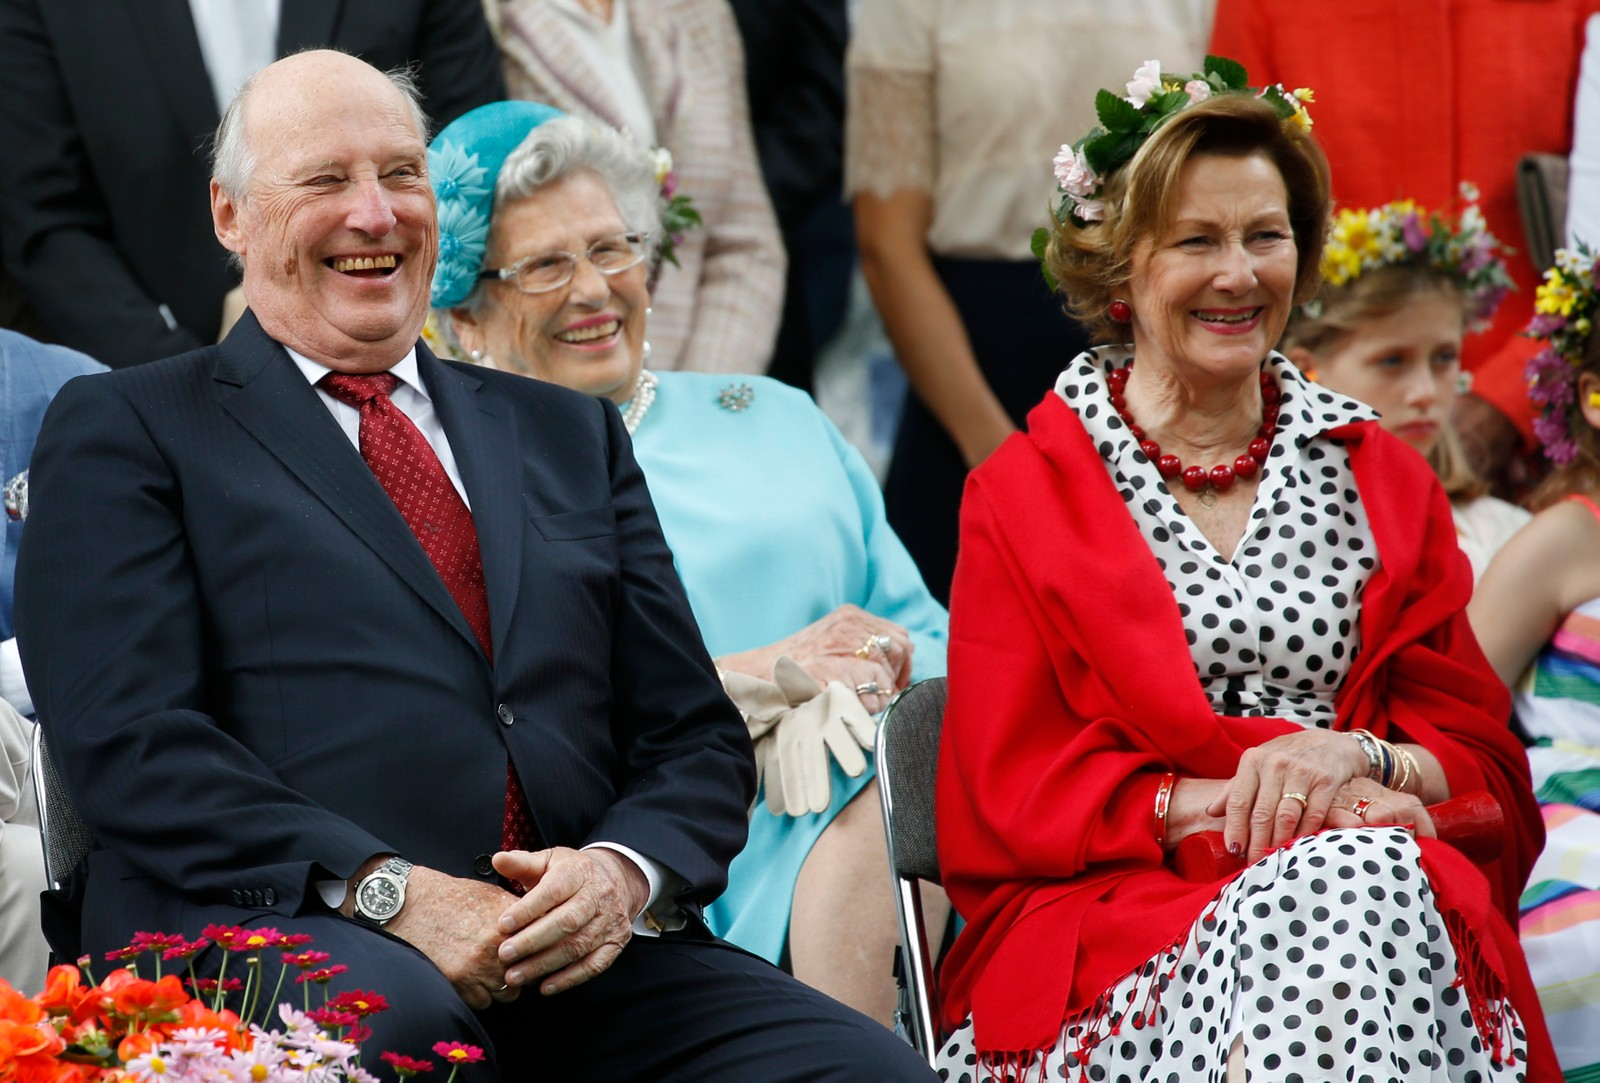 Kong Harald, dronning Sonja og prinsesse Astrid i hageselskapet i Stiftsgården i Trondheim i forbindelse kongeparet 25 år som kongepar torsdag.